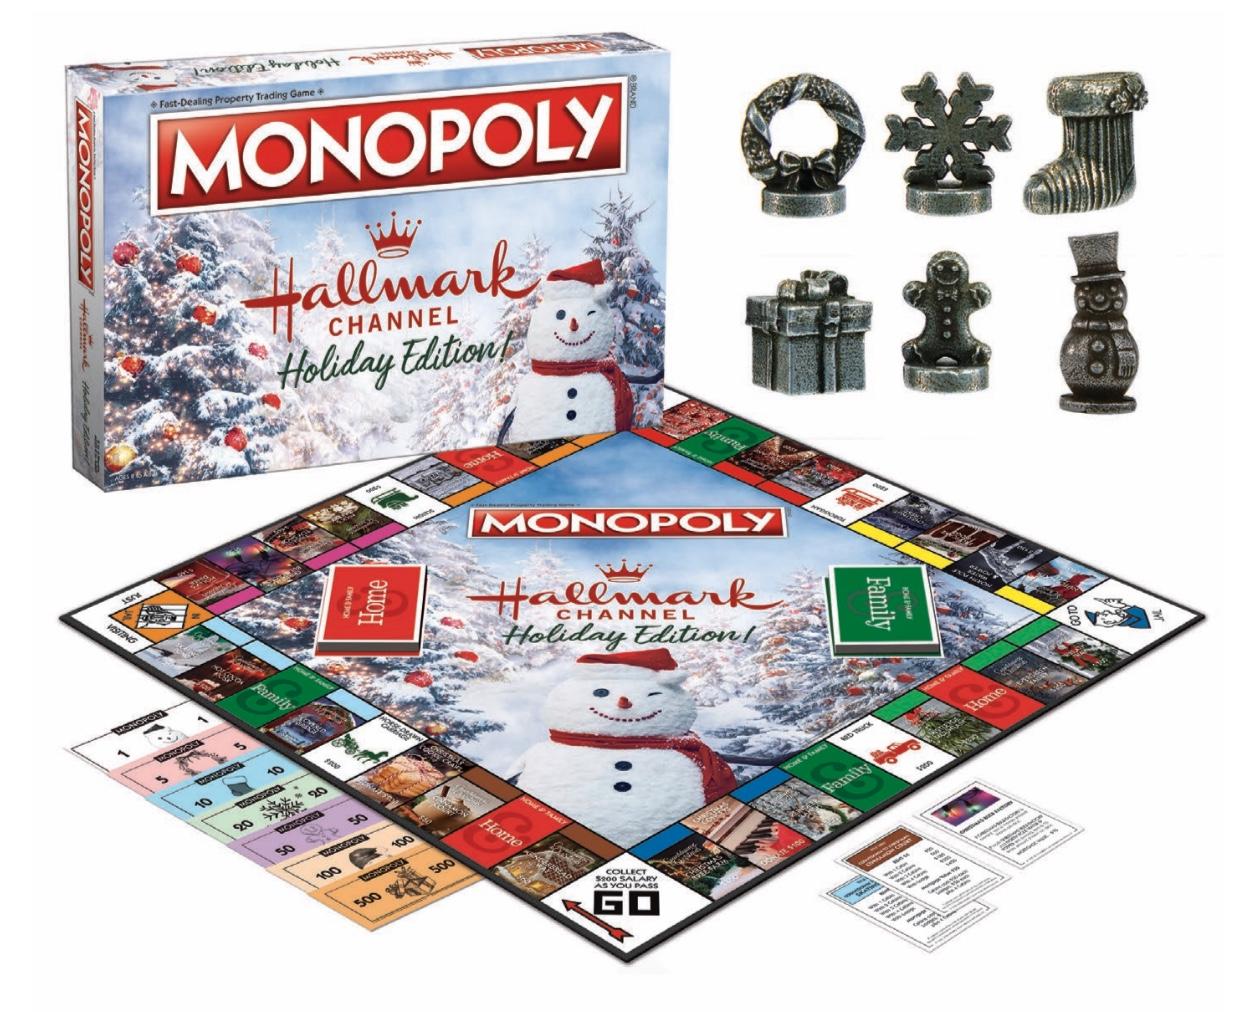 Hallmark Channel Monopoly Game